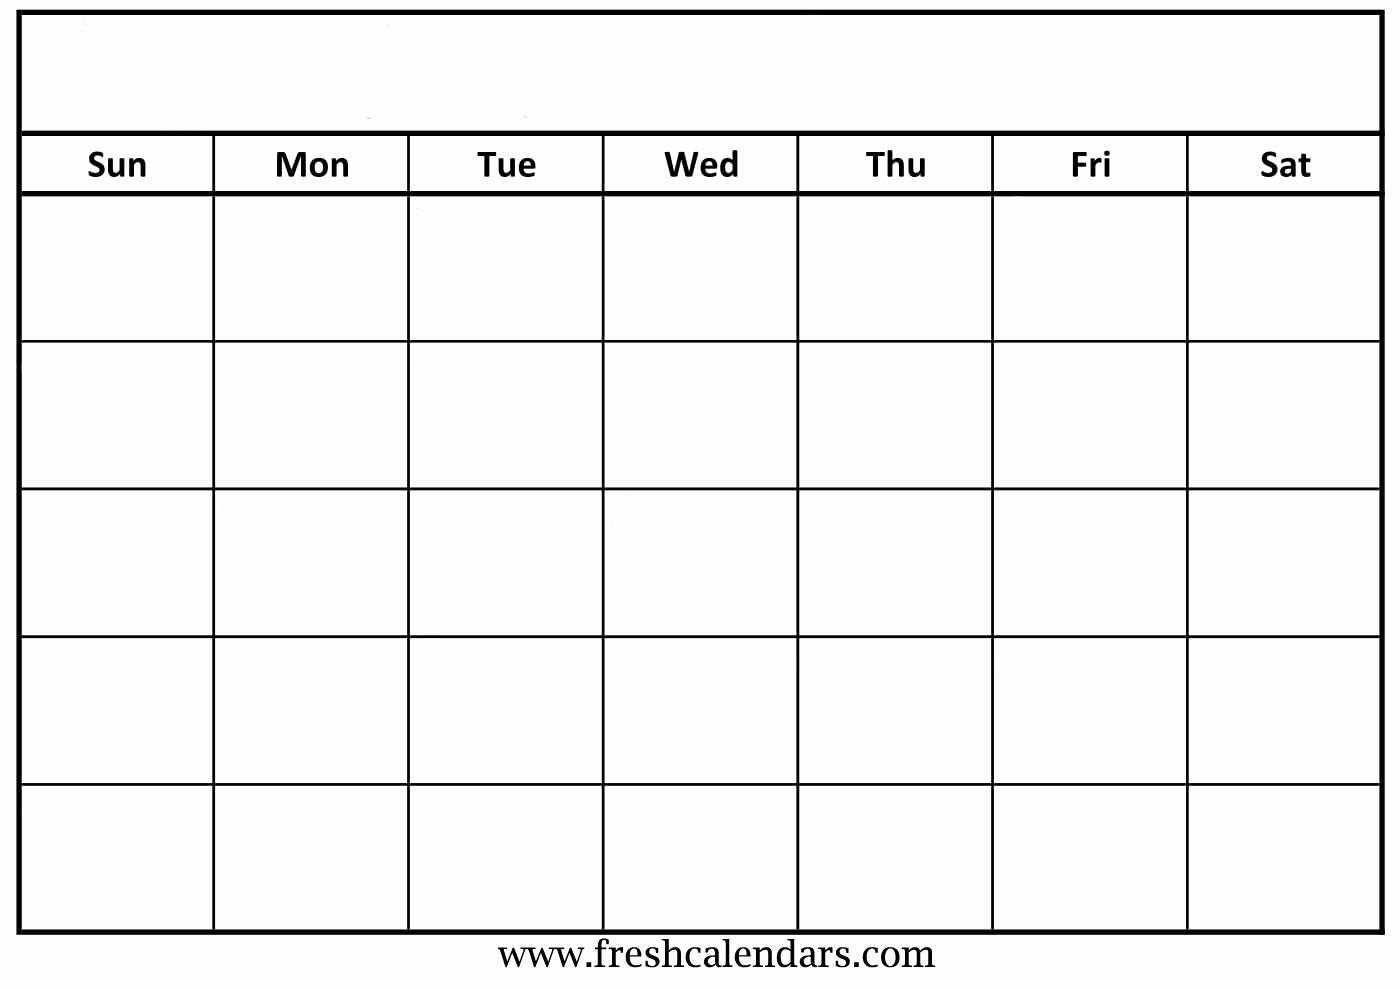 Printable Blank Monthly Calendar Template Unique Blank Calendar Wonderfully Printable 2019 Templates